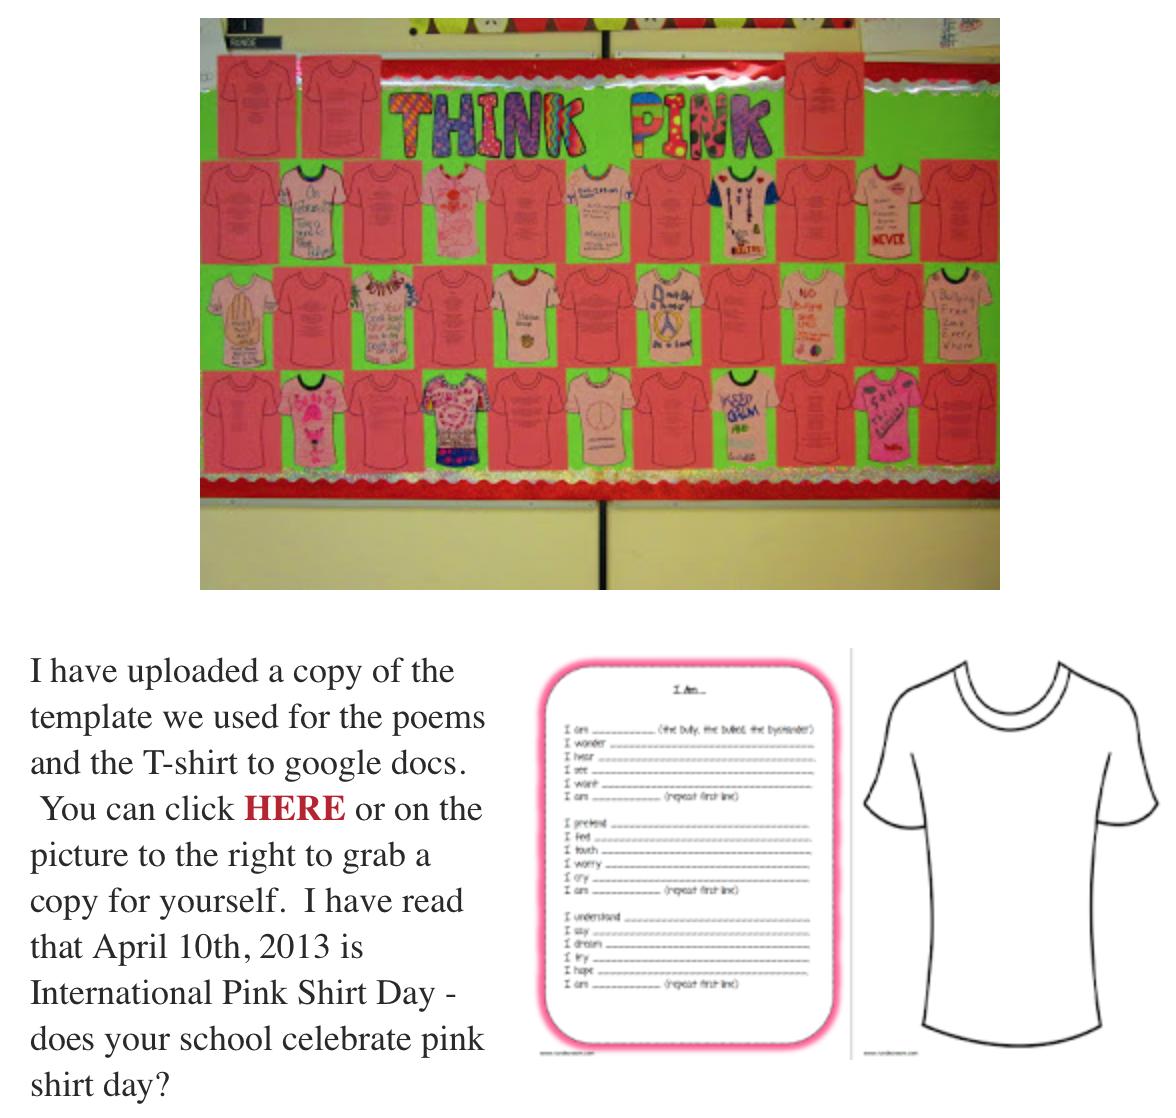 Think Pink National Pink Shirt Day